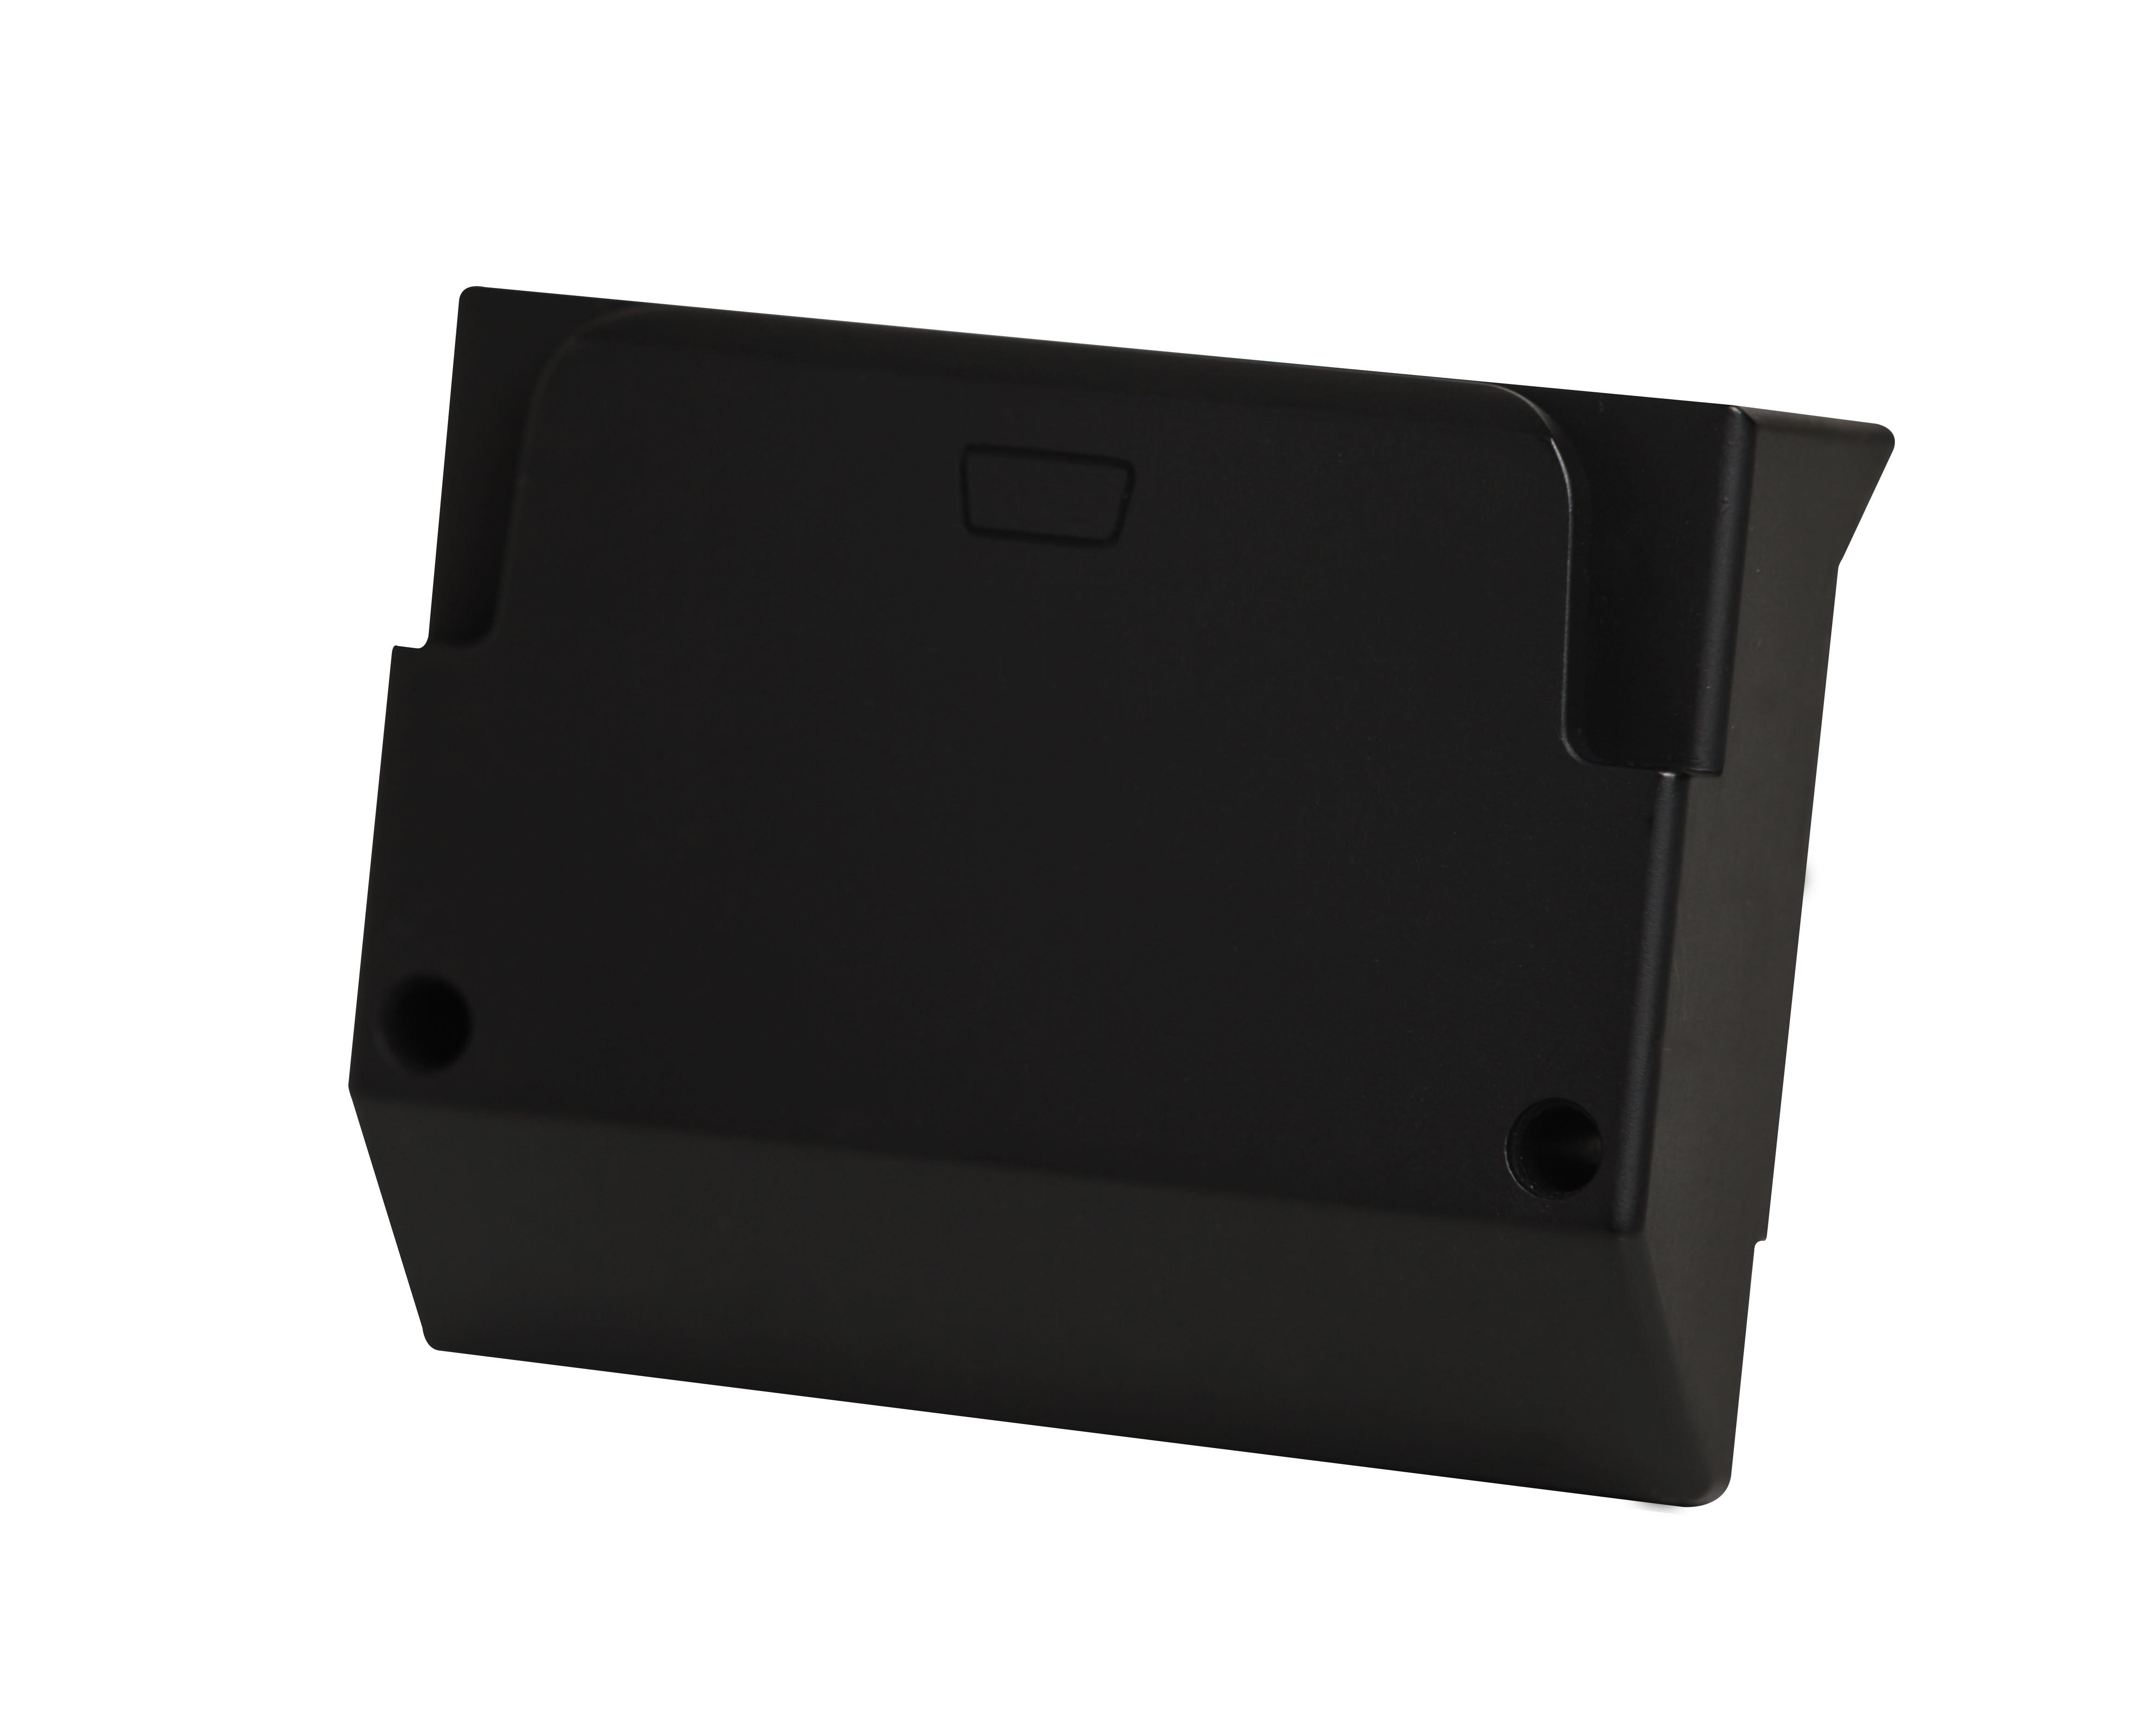 MSR/Smart Card Combo